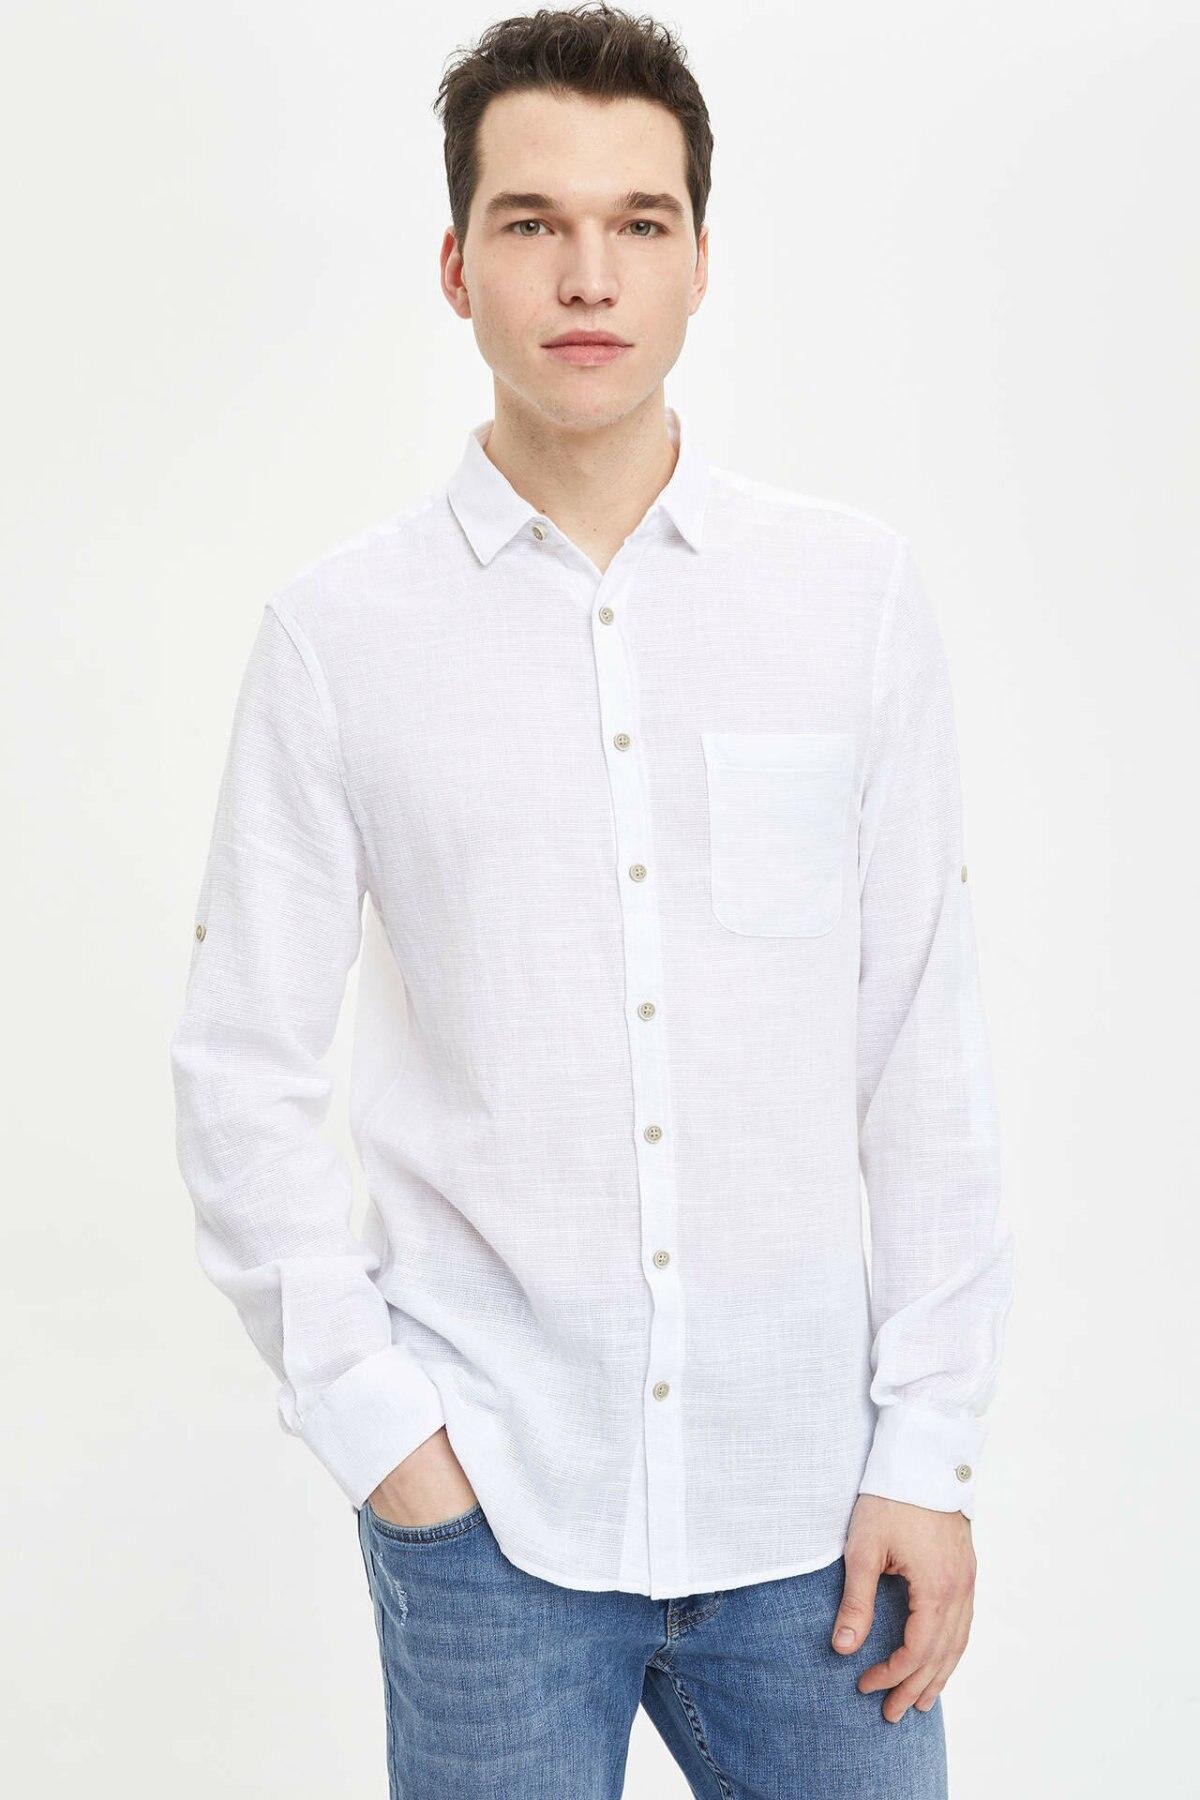 DeFacto Formal Man Shirt Fashion Male Casual Lapel Shirts Men's High Quality Long Sleeves Blousers White -M3632AZ19SM